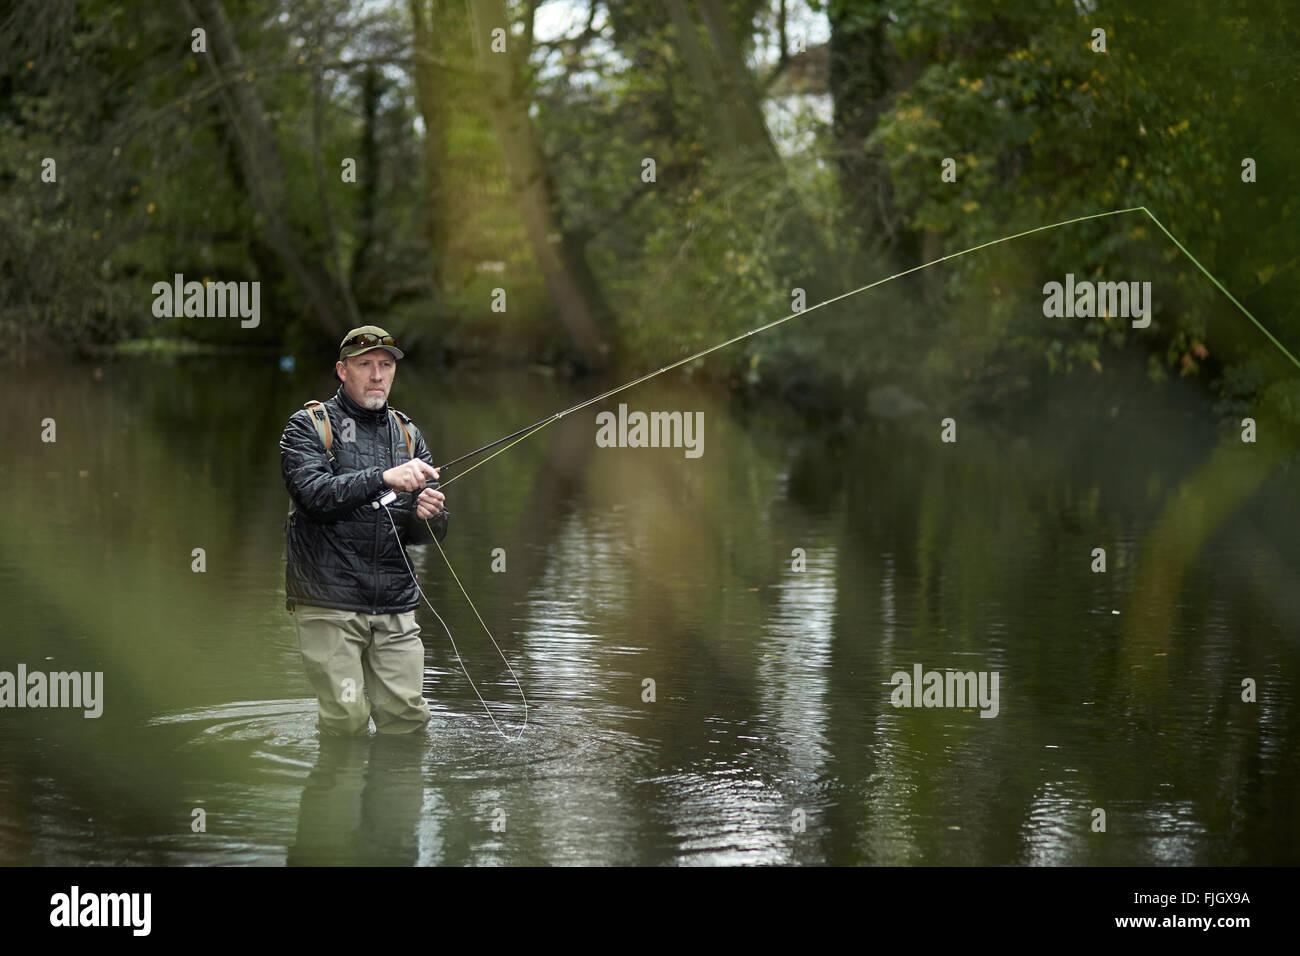 Un hombre pesca con mosca en un río - LONDRES, REINO UNIDO Imagen De Stock